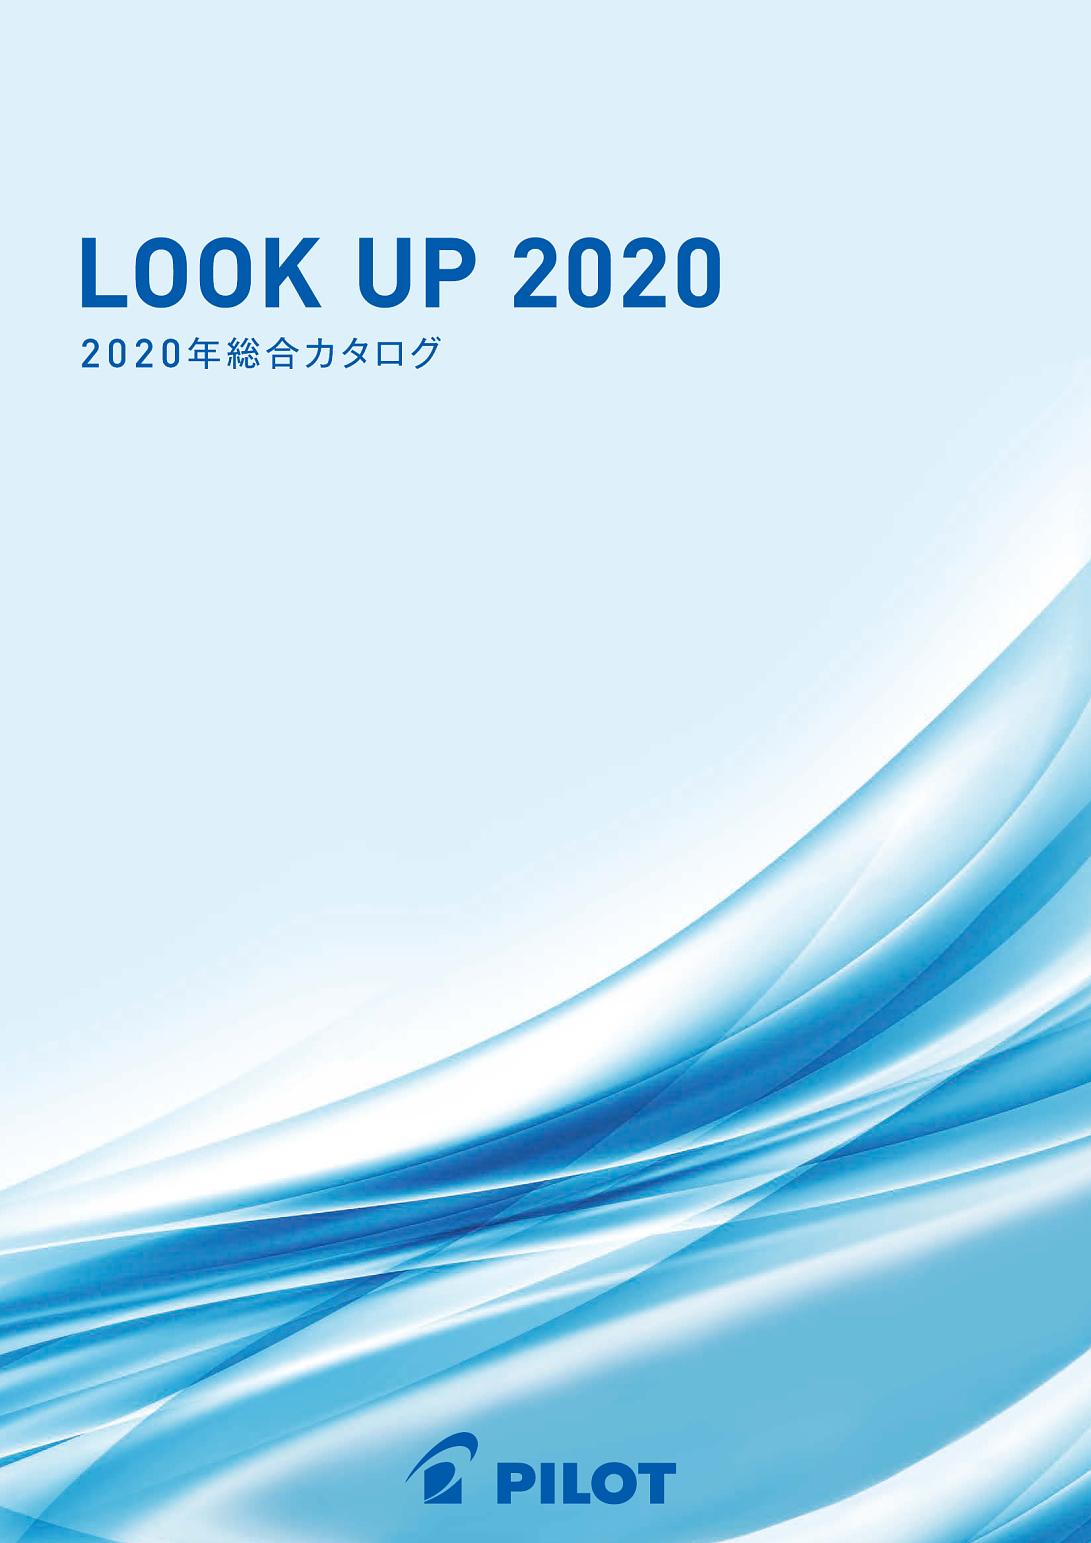 LOOK UP 2020/2020年パイロット総合カタログ | カタログビュー